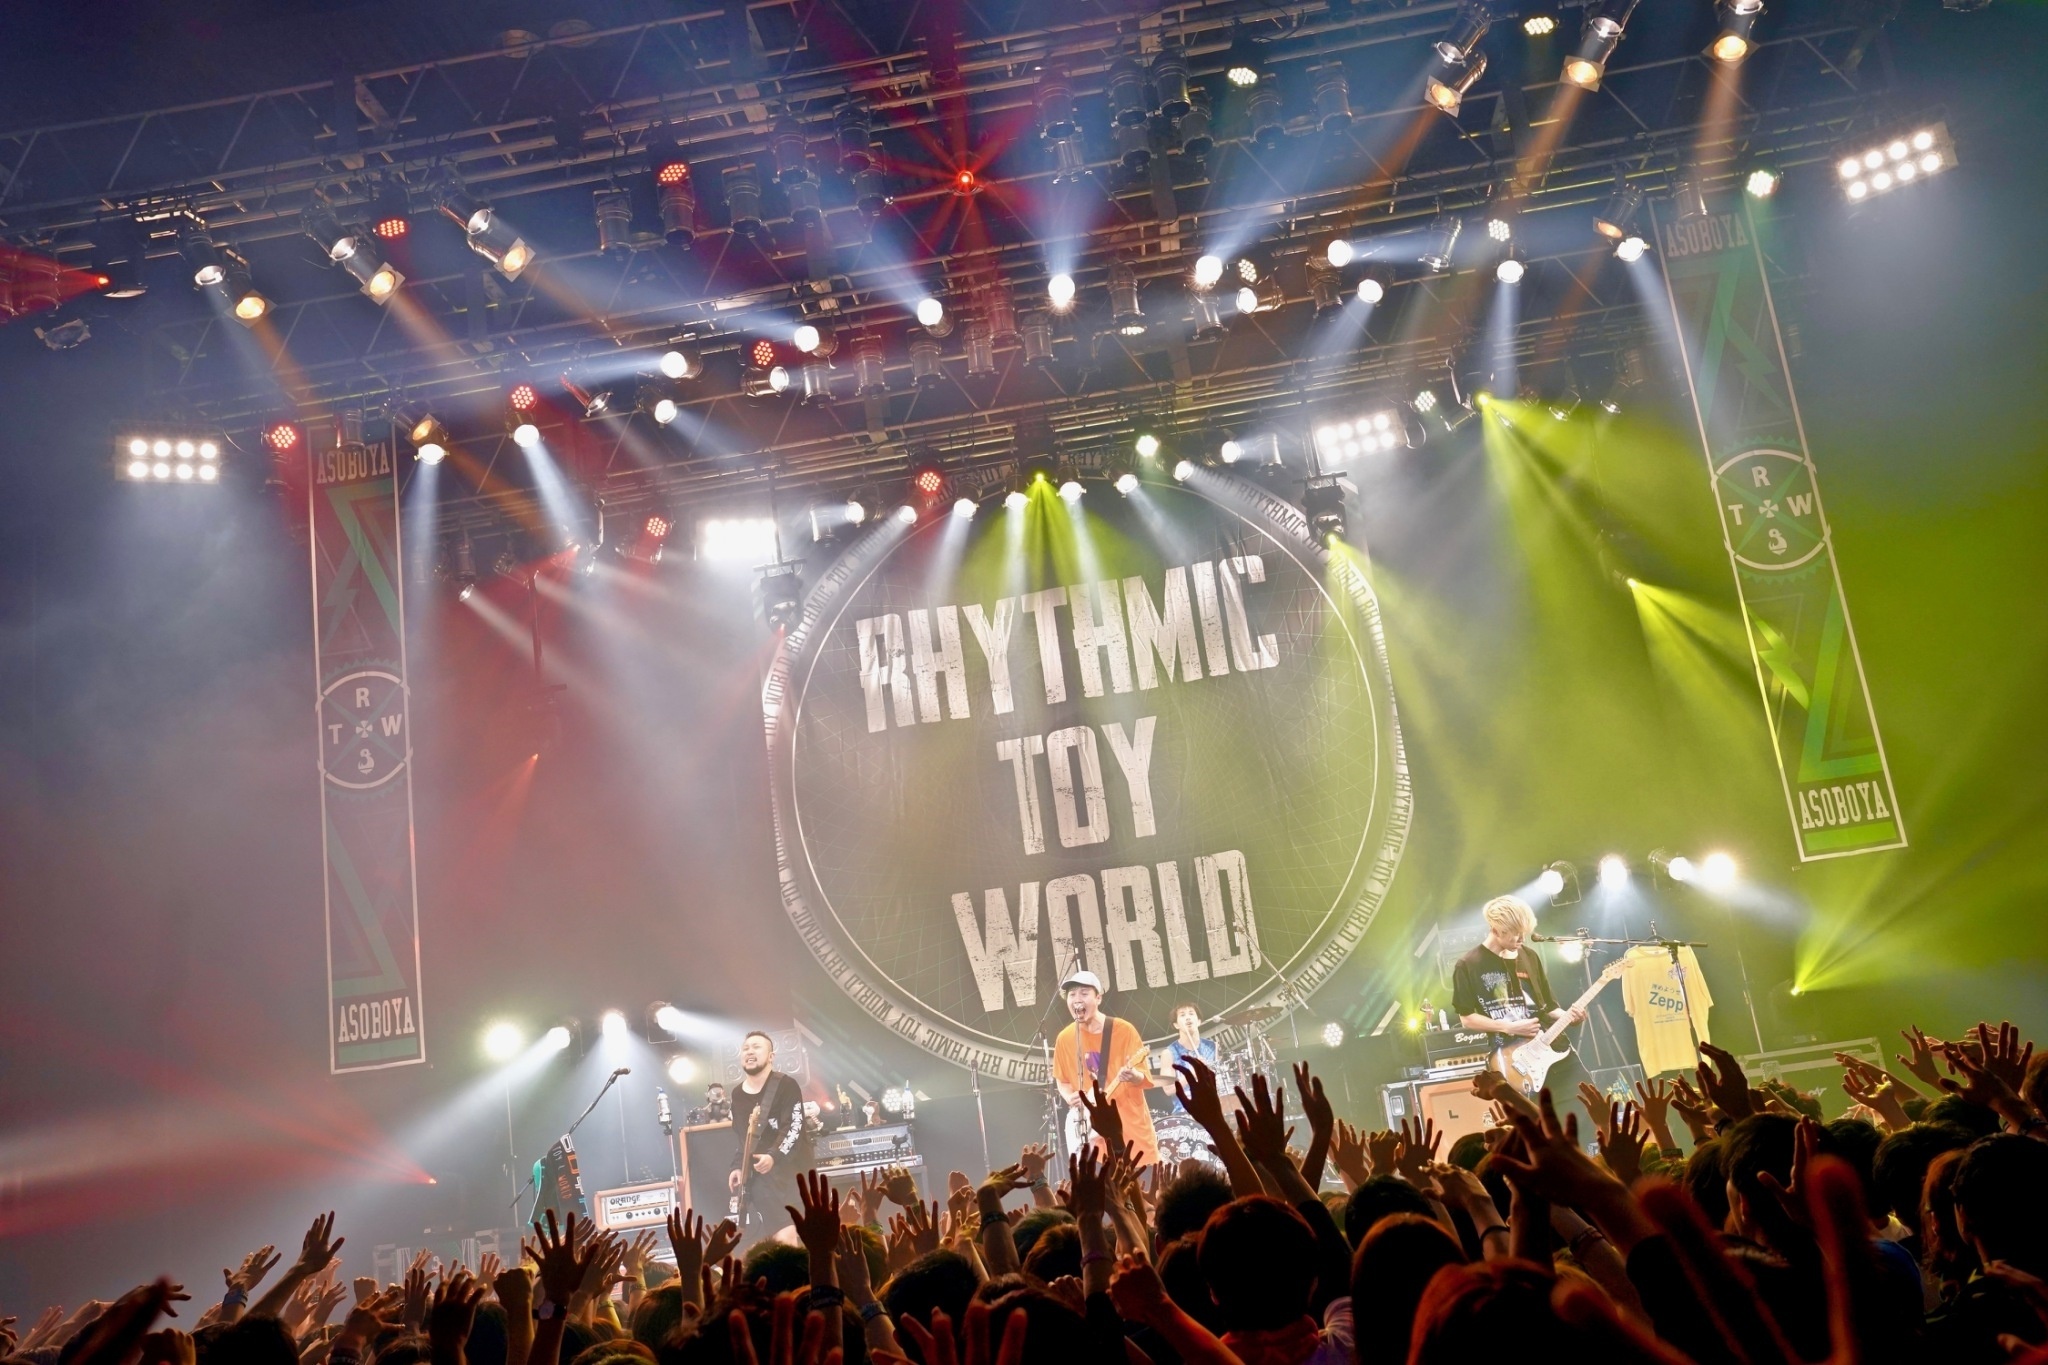 Rhythmic Toy World 撮影=佐藤広理